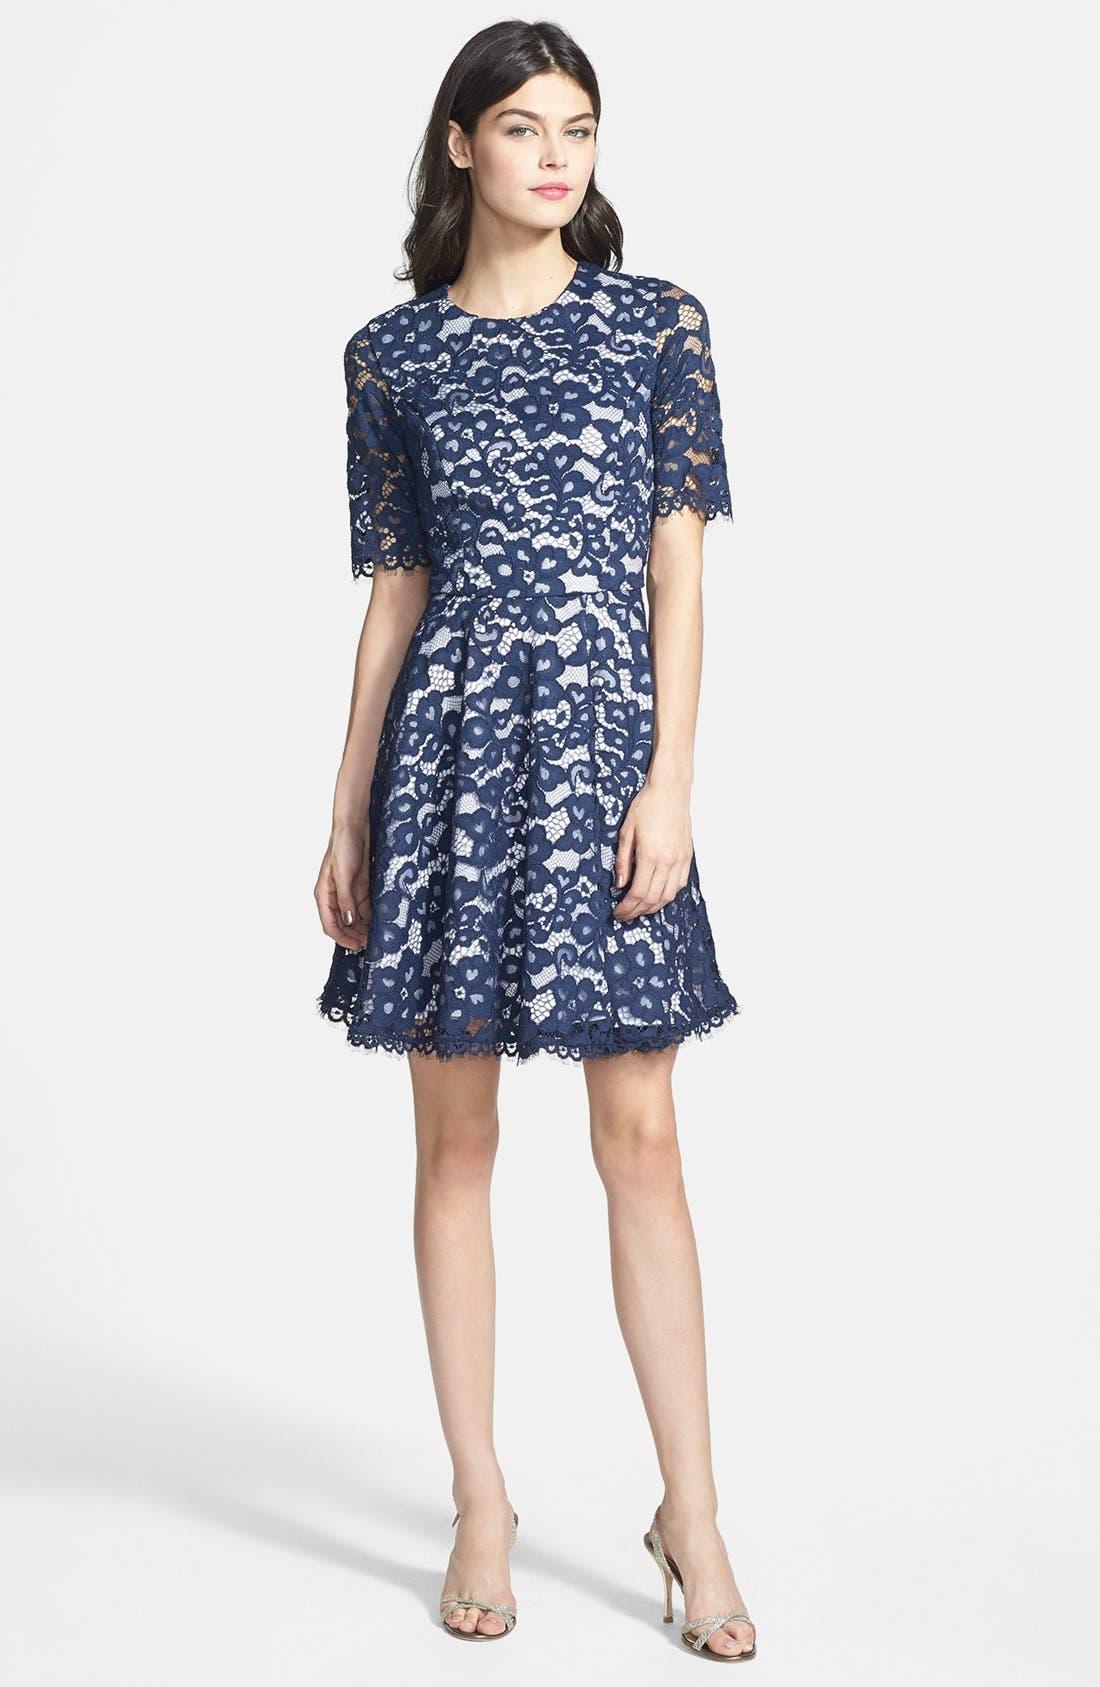 Alternate Image 1 Selected - Shoshanna 'Carmen' Lace Fit & Flare Dress